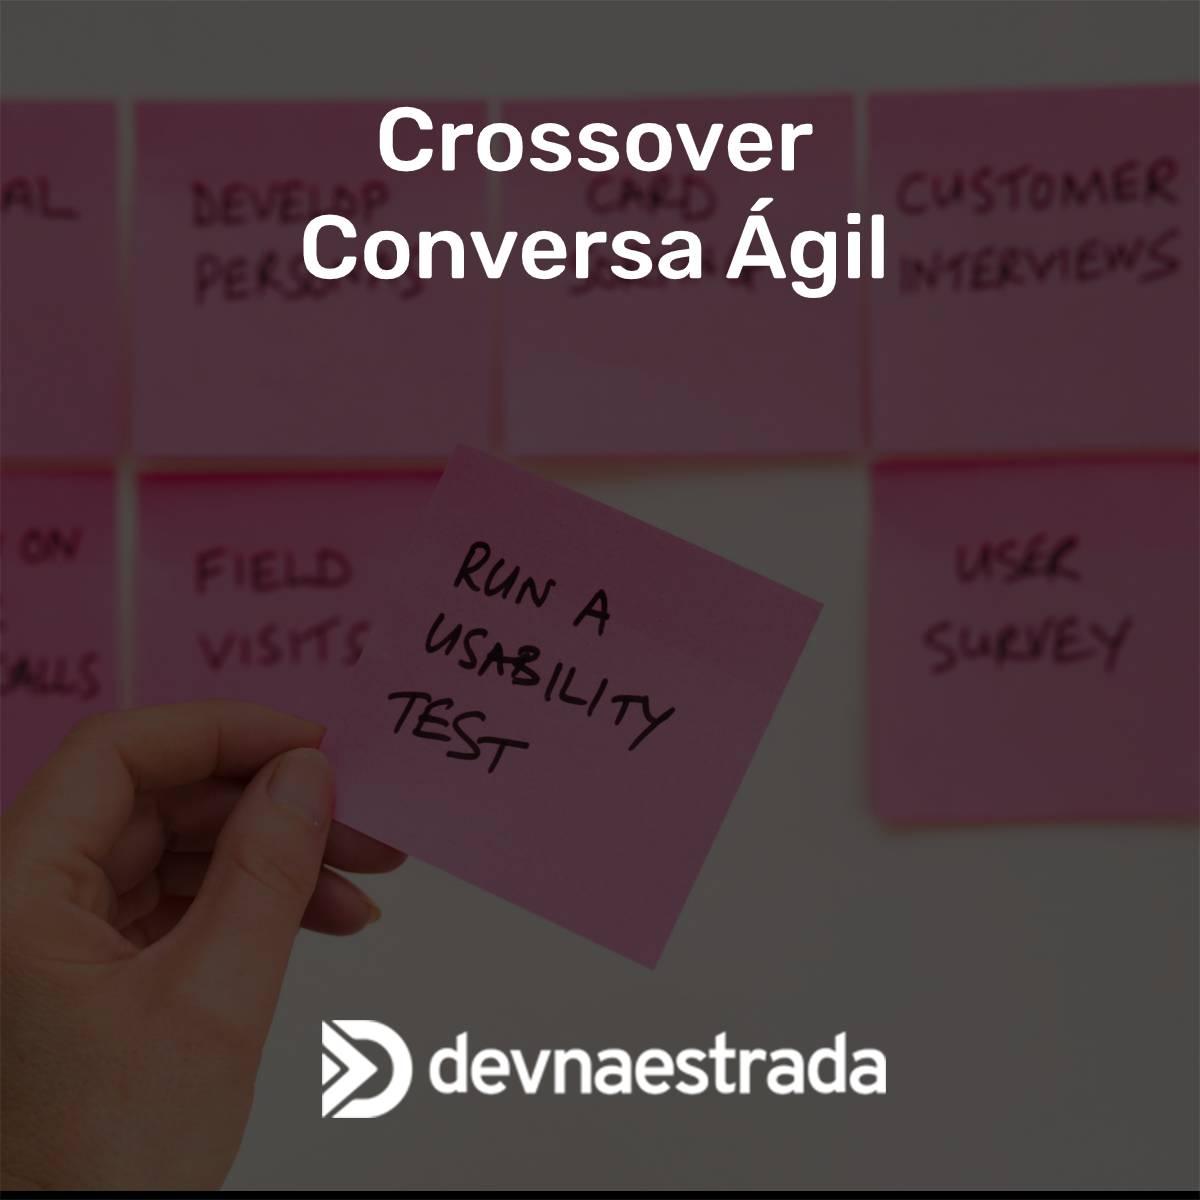 Crossover Conversa Ágil